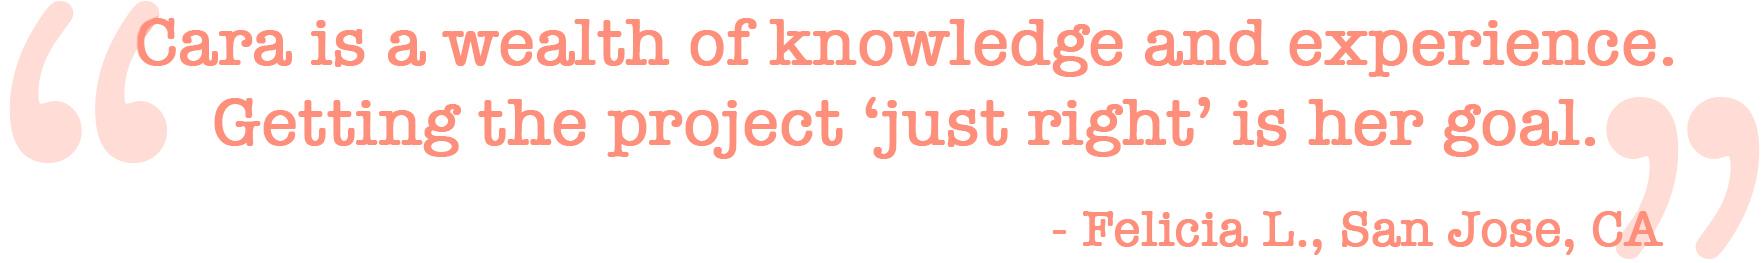 Quote Felicia.jpg